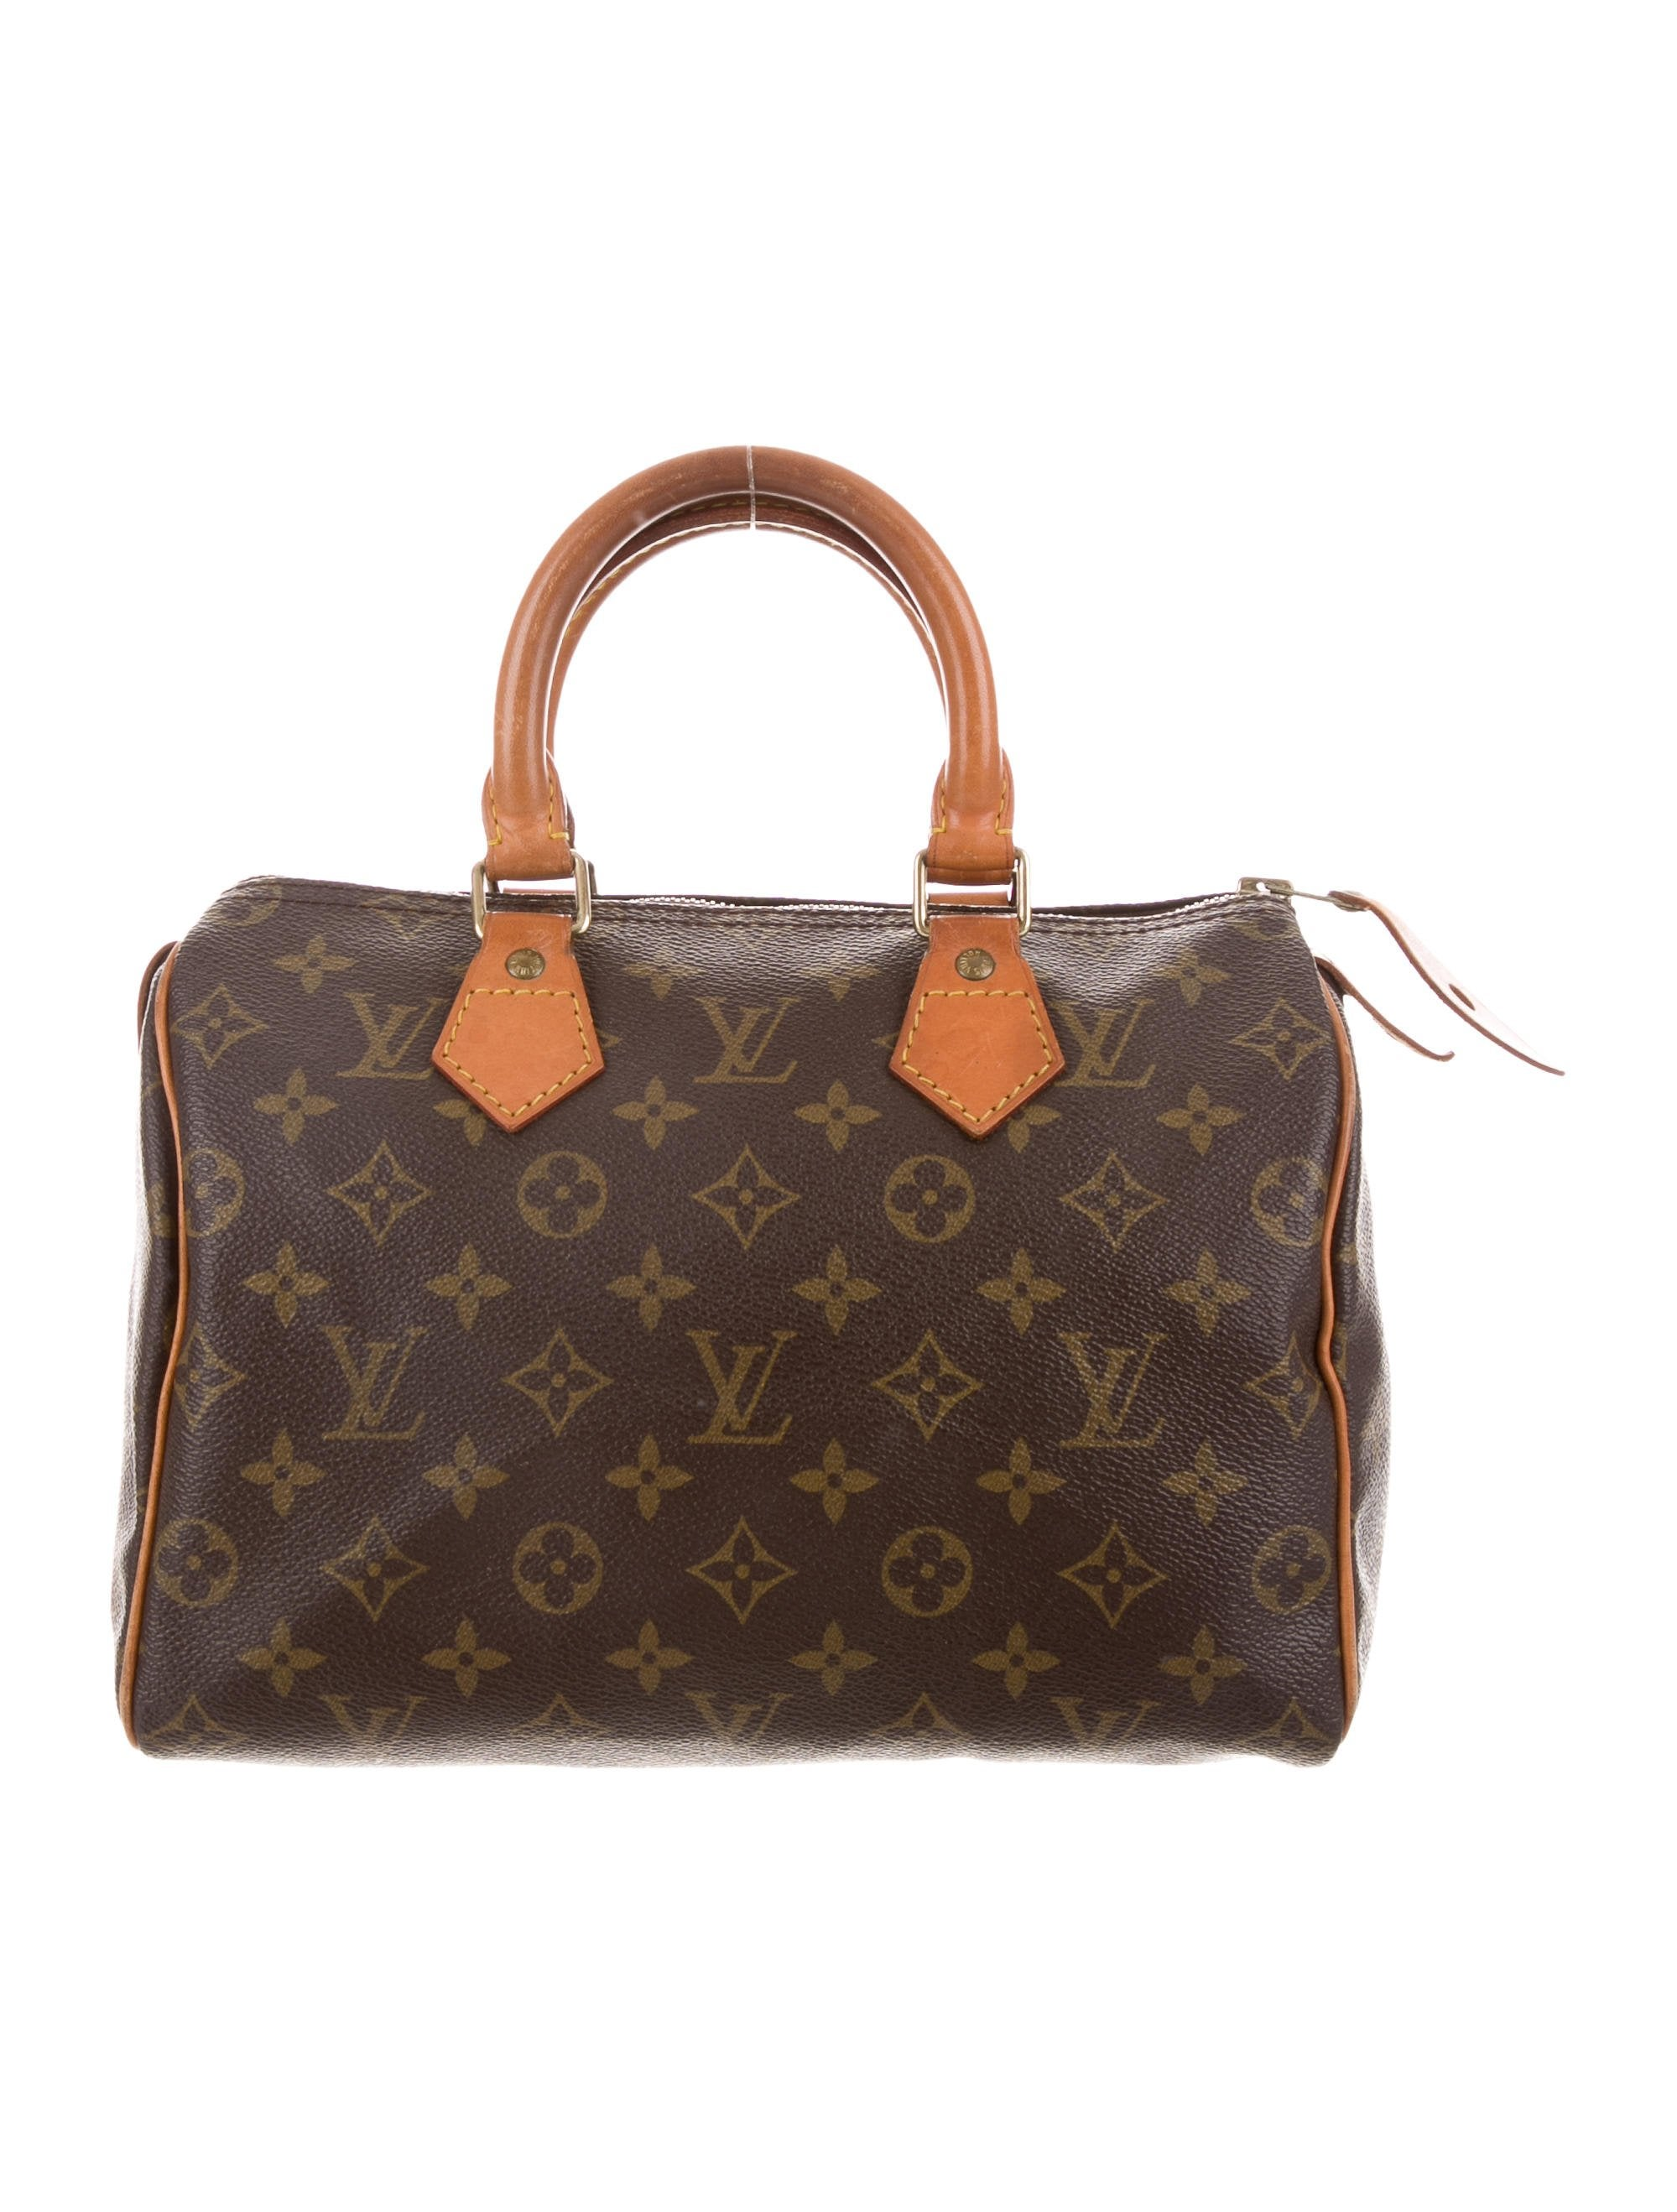 Handbags   The RealReal 23816a69fc